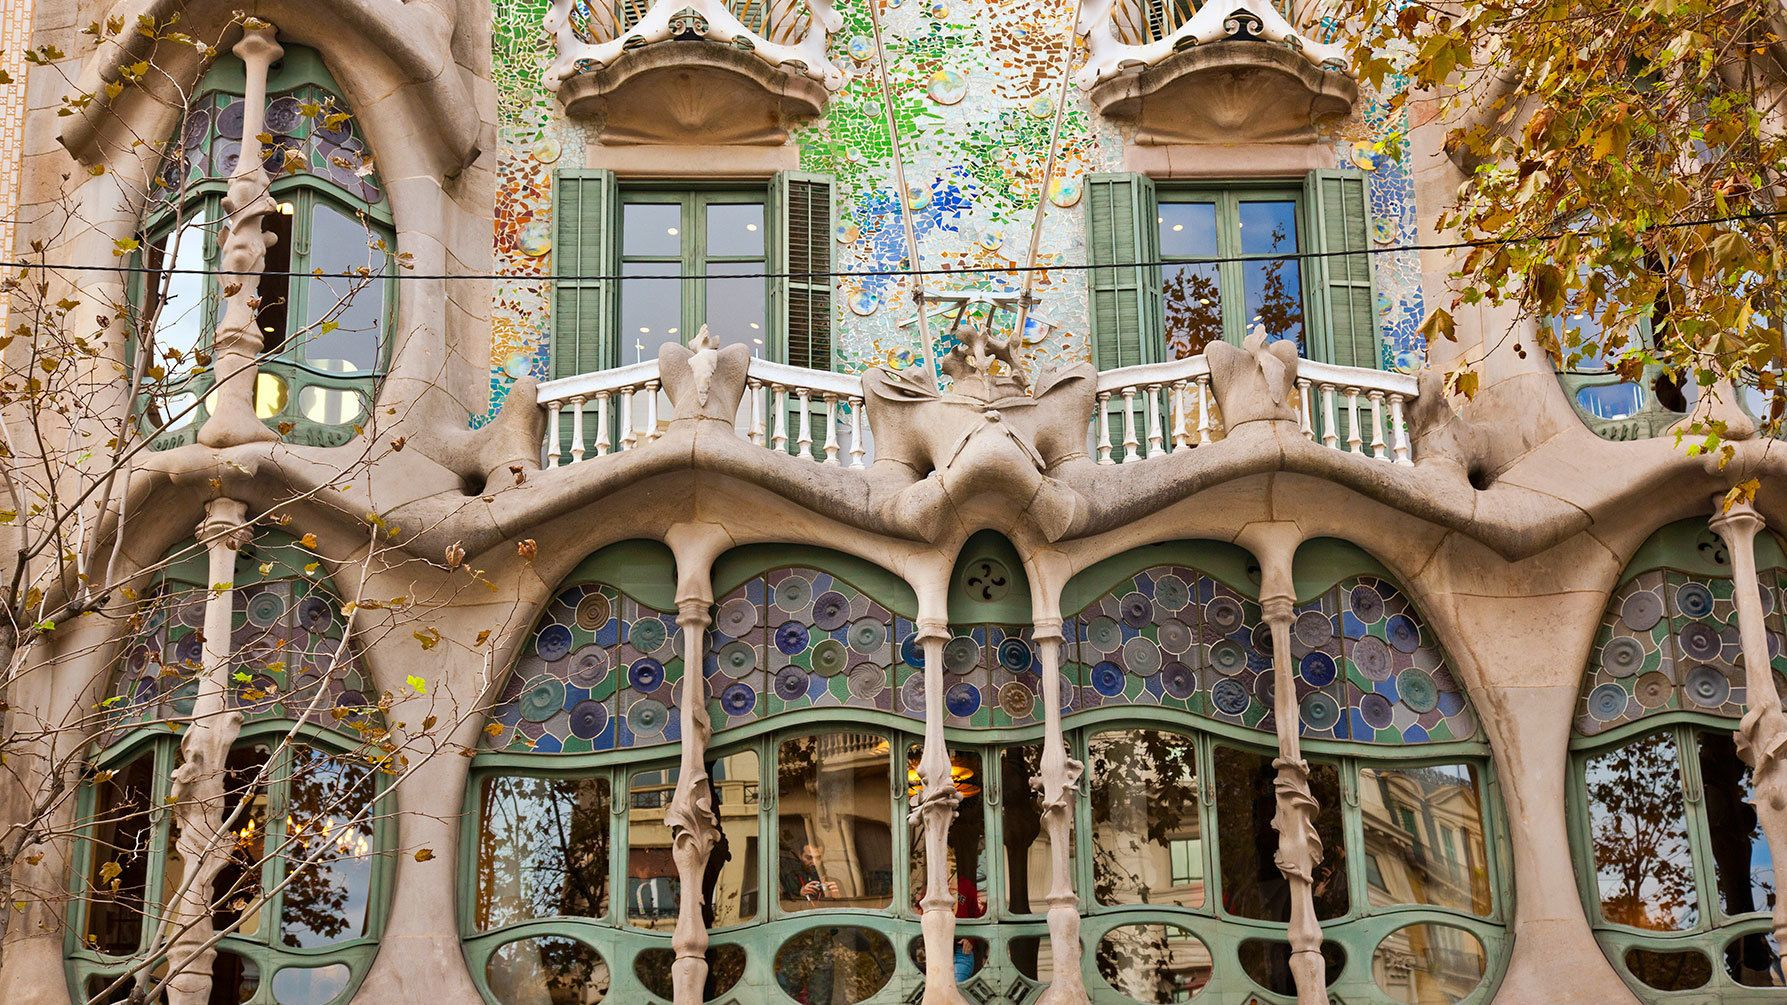 Skip-the-Line Casa Batlló Tickets with SmartGuide